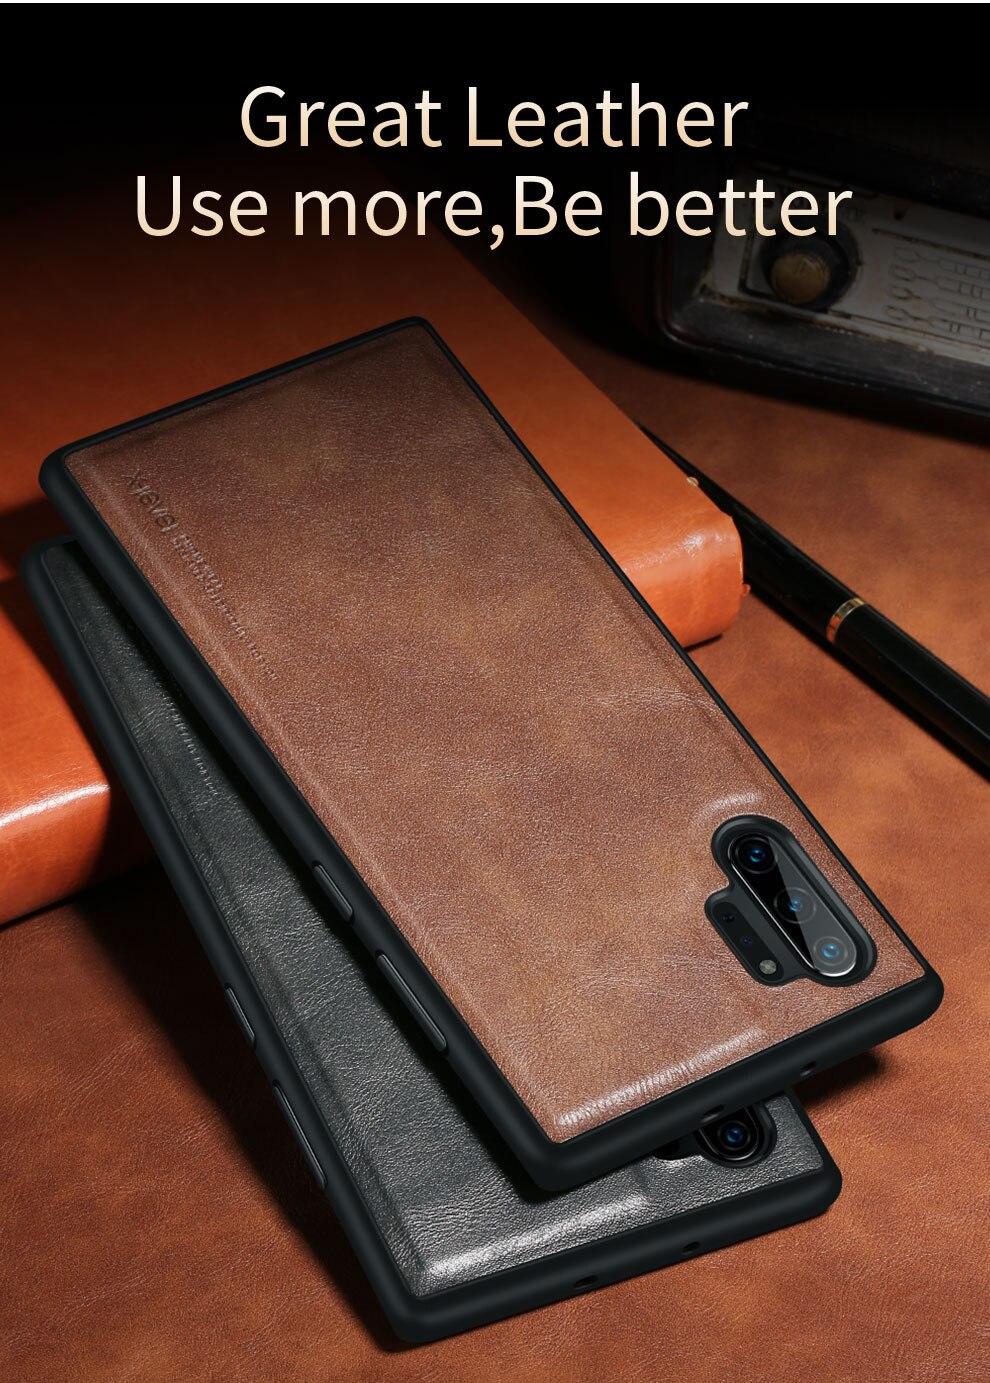 H56f0e2f5d4b54a2cb83747330349ef3ba X-Level Leather Case For Samsung Note 10 Plus Soft Silicone Edge Back Phone Cover For Samsung Galaxy Note 10 Case Note10 Plus